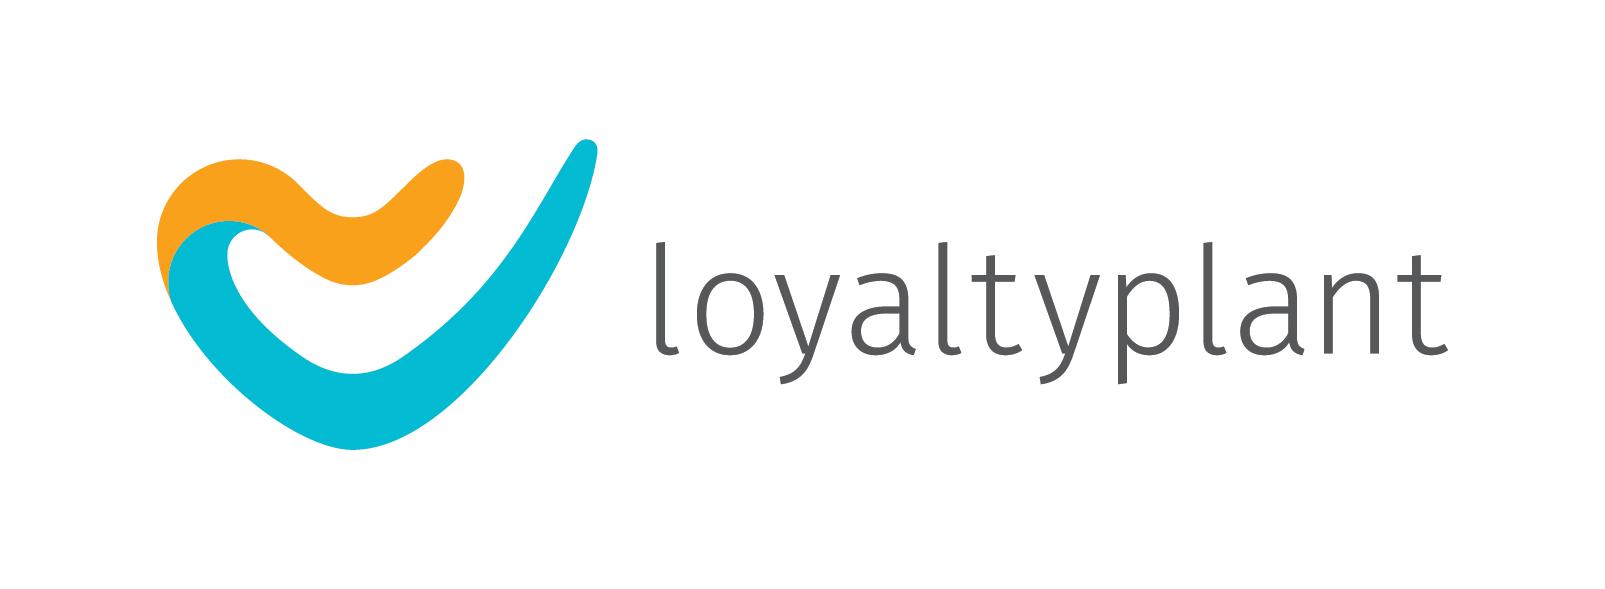 loyalty plant logo